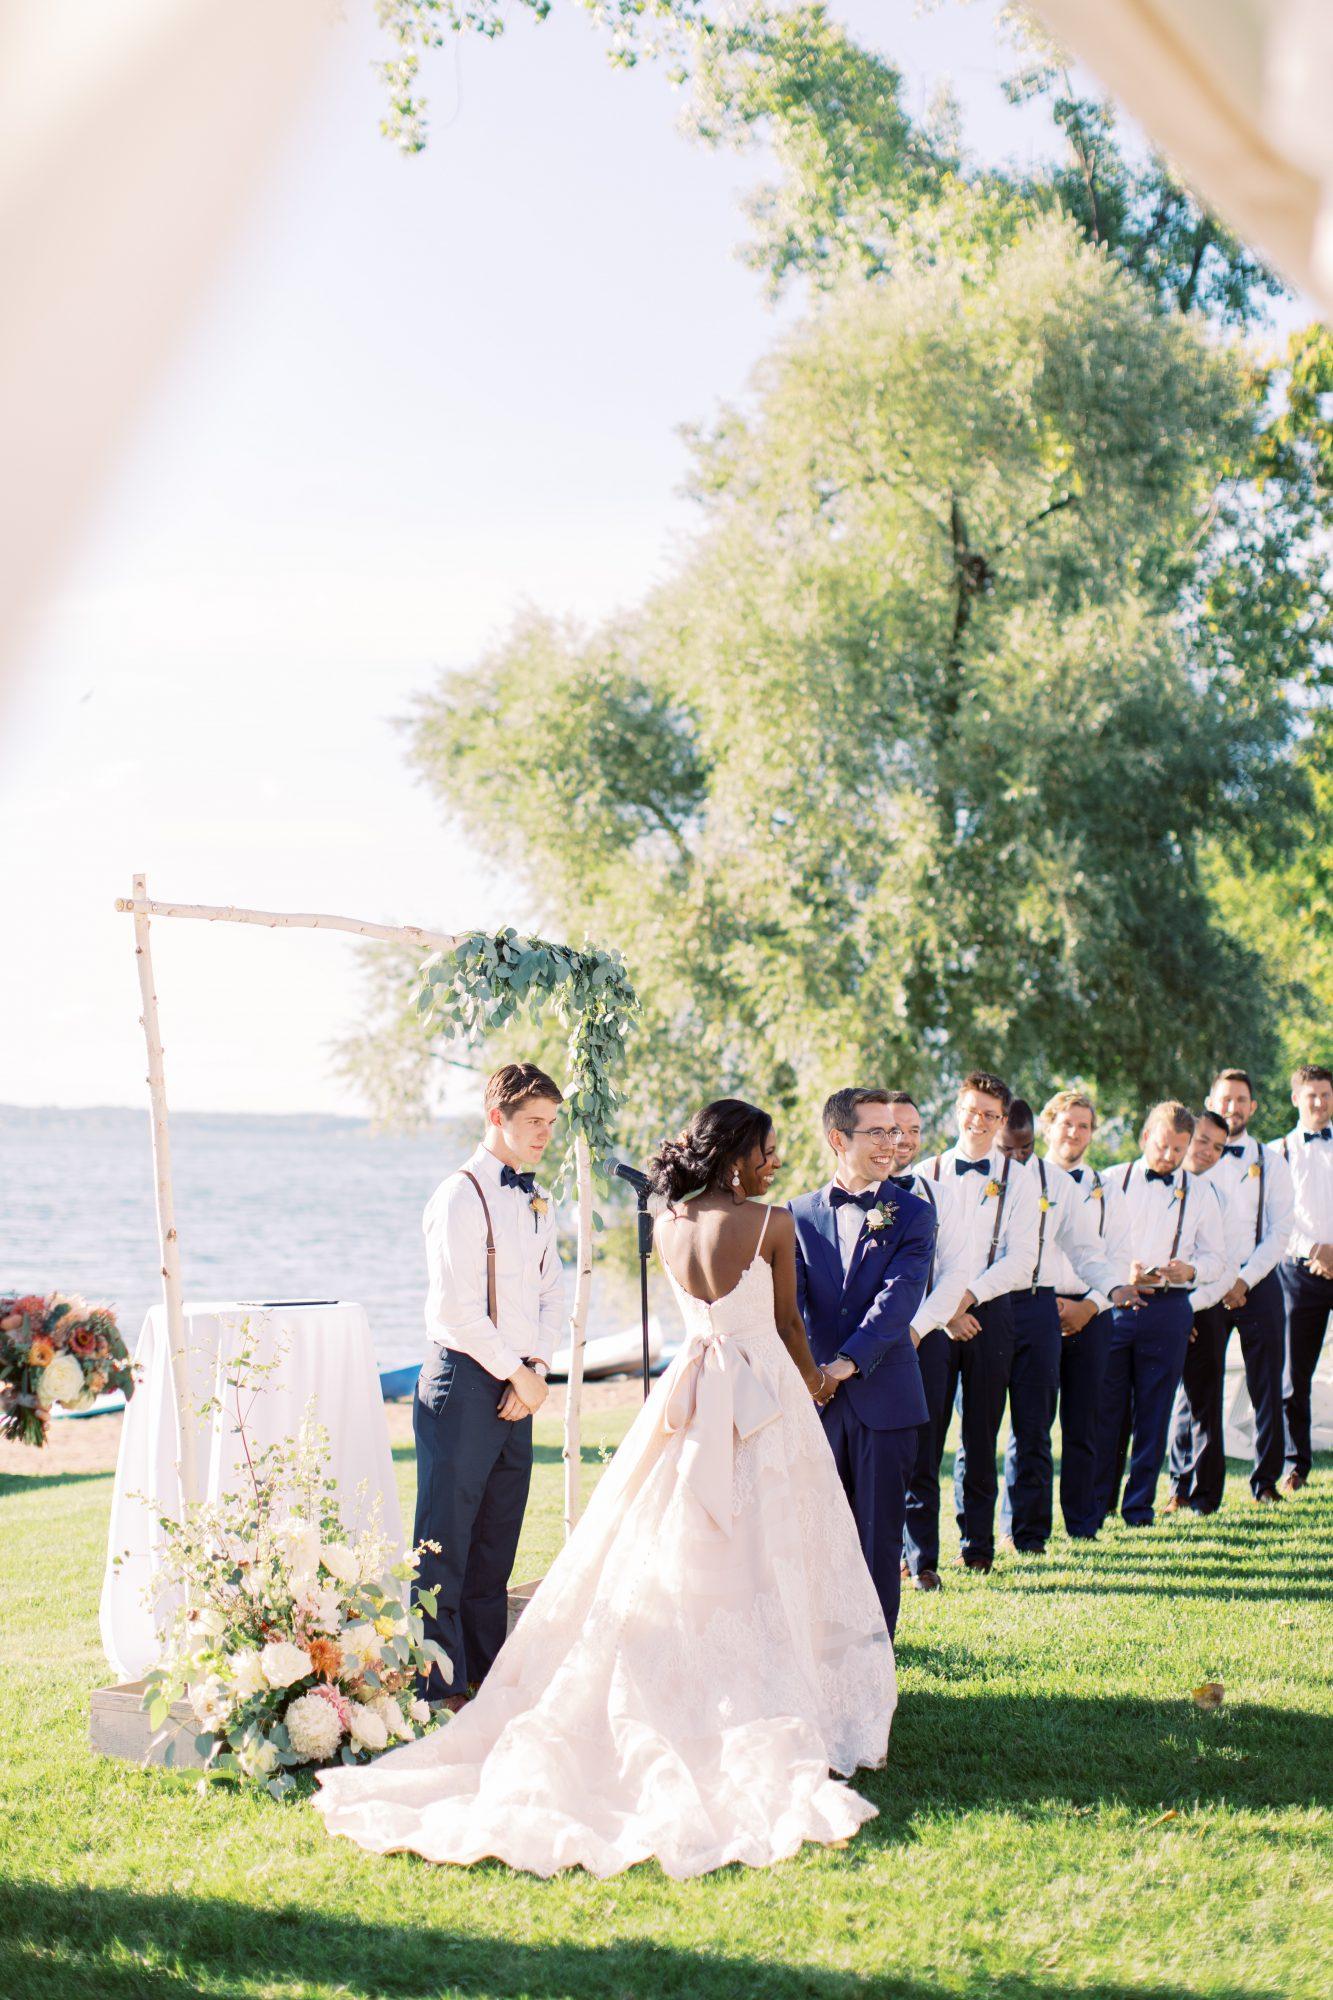 charlene jeremy wedding ceremony